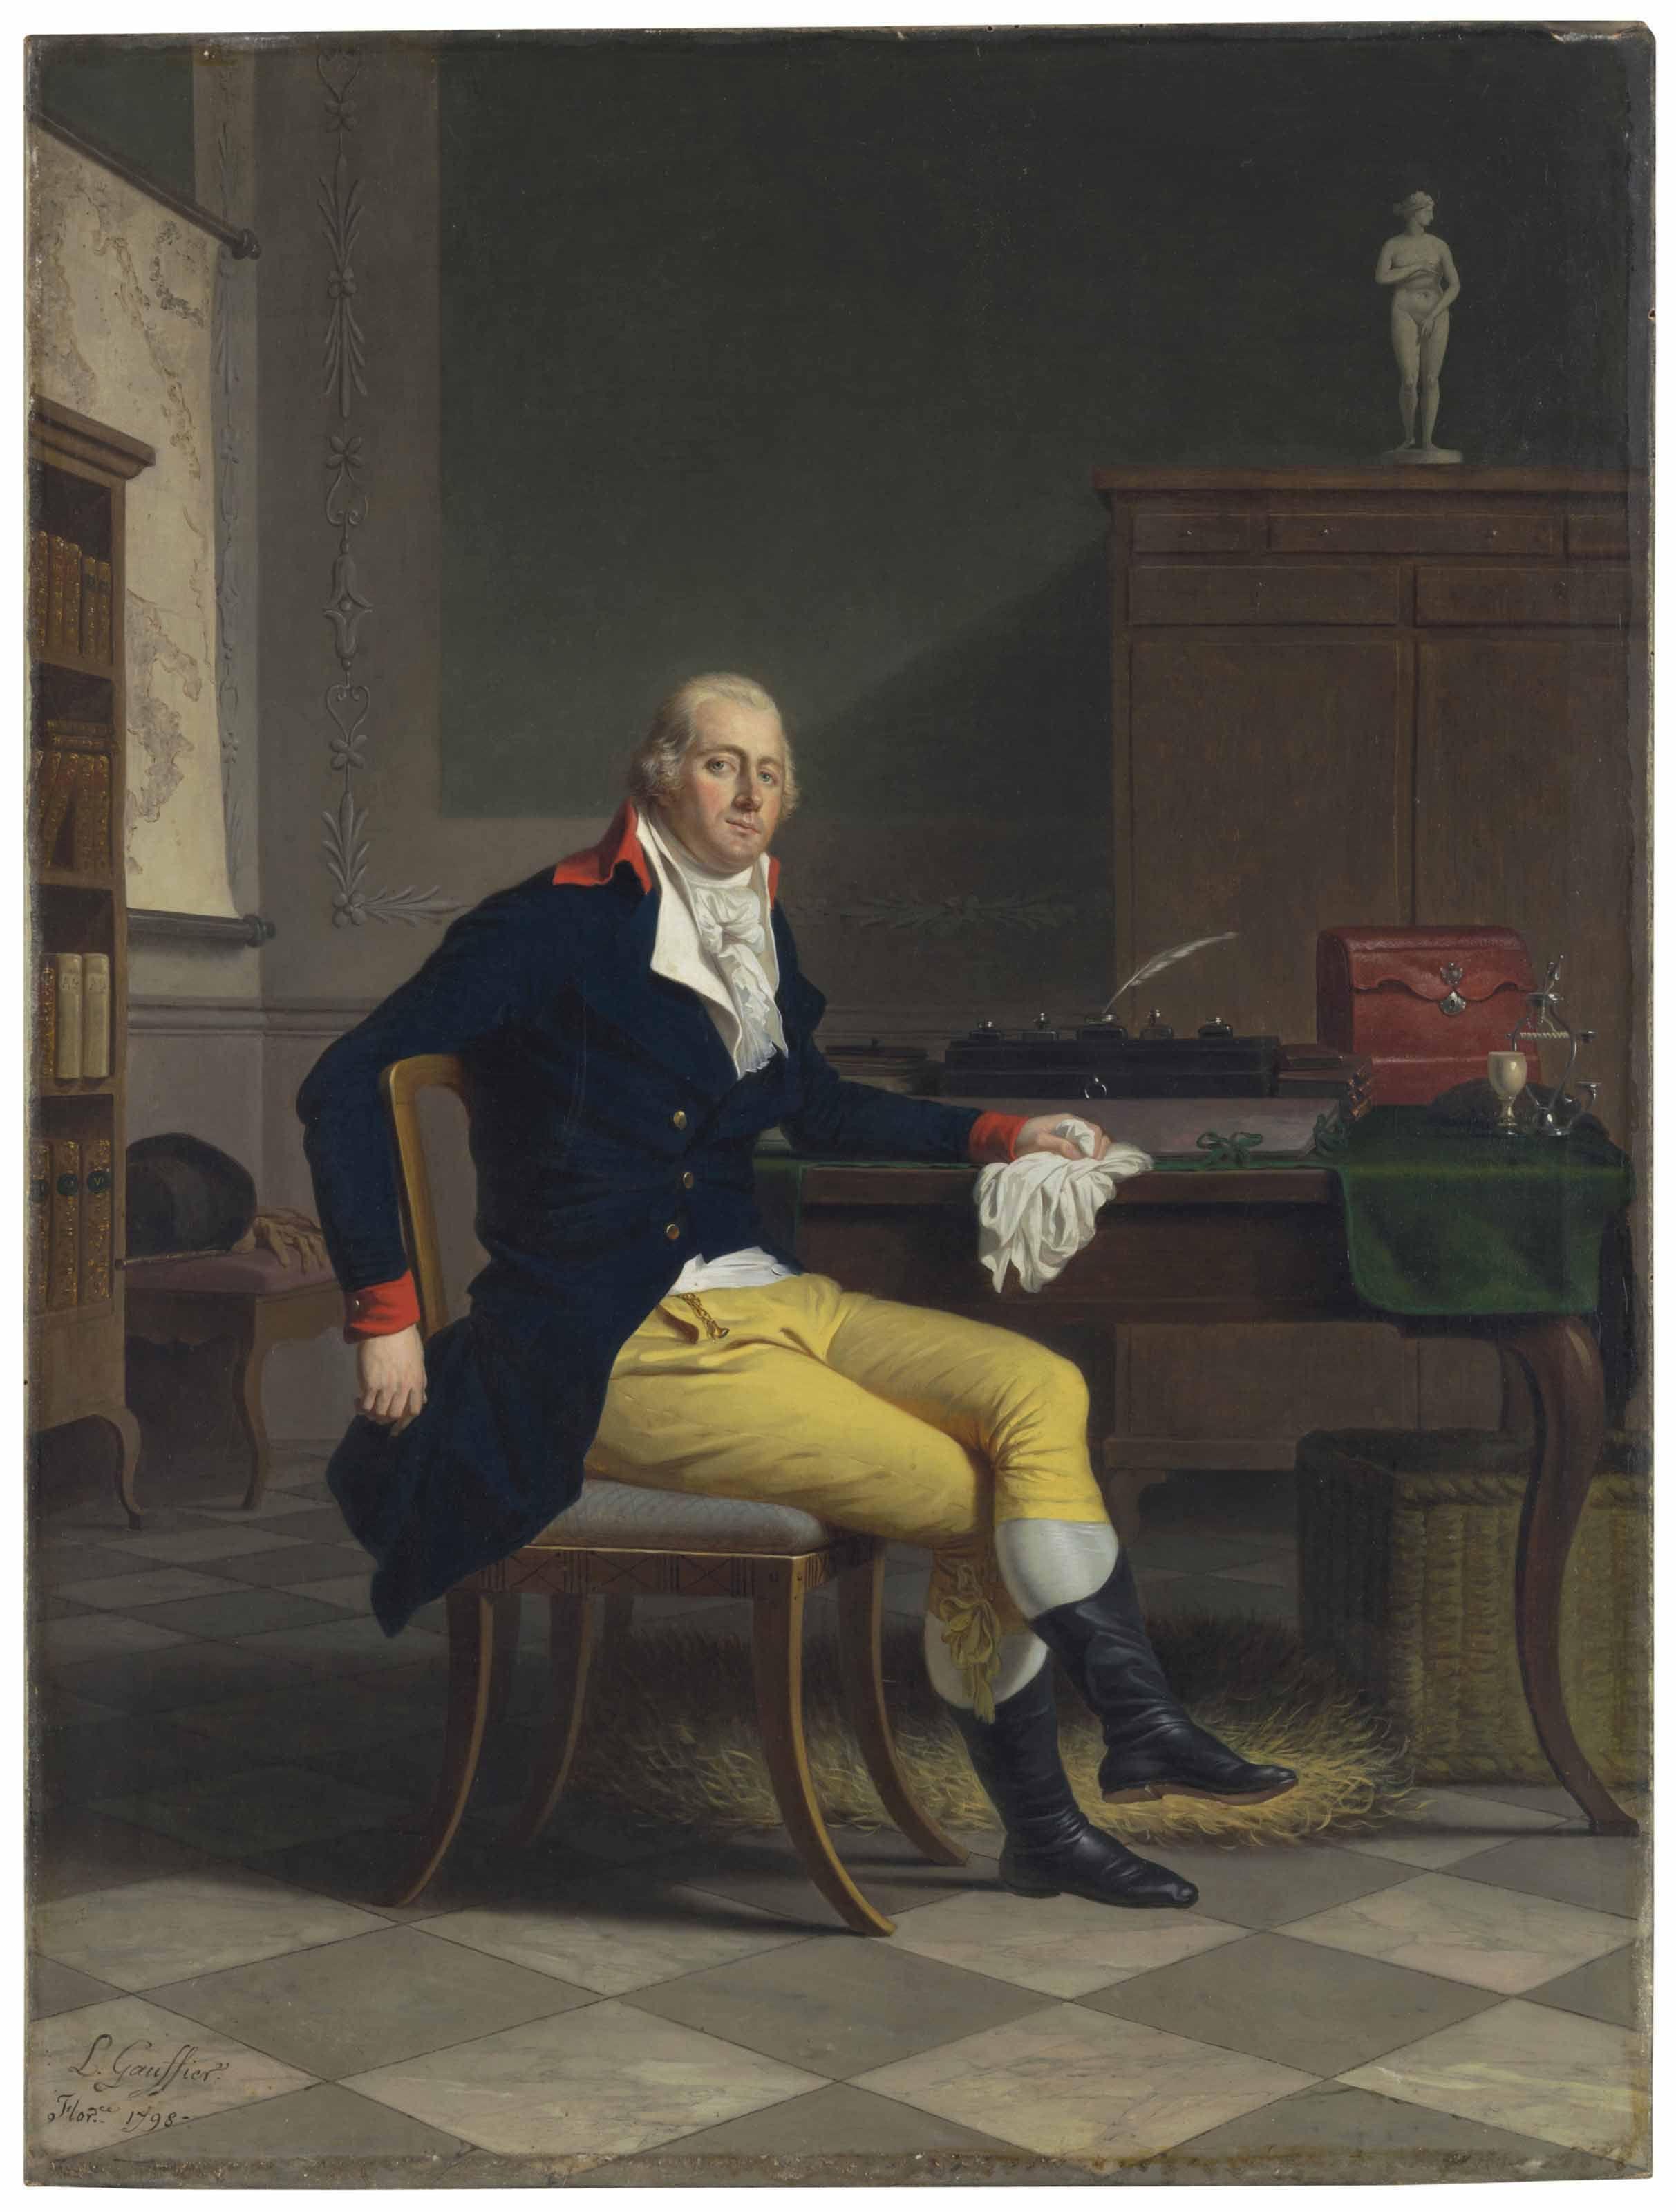 Louis Gauffier Poitiers 1762 1801 Livorno Portrait Of Ferdinando Nerli 1770 1829 Seated In An Interior Full Le Portrait Contemporary Portrait Guy Pictures